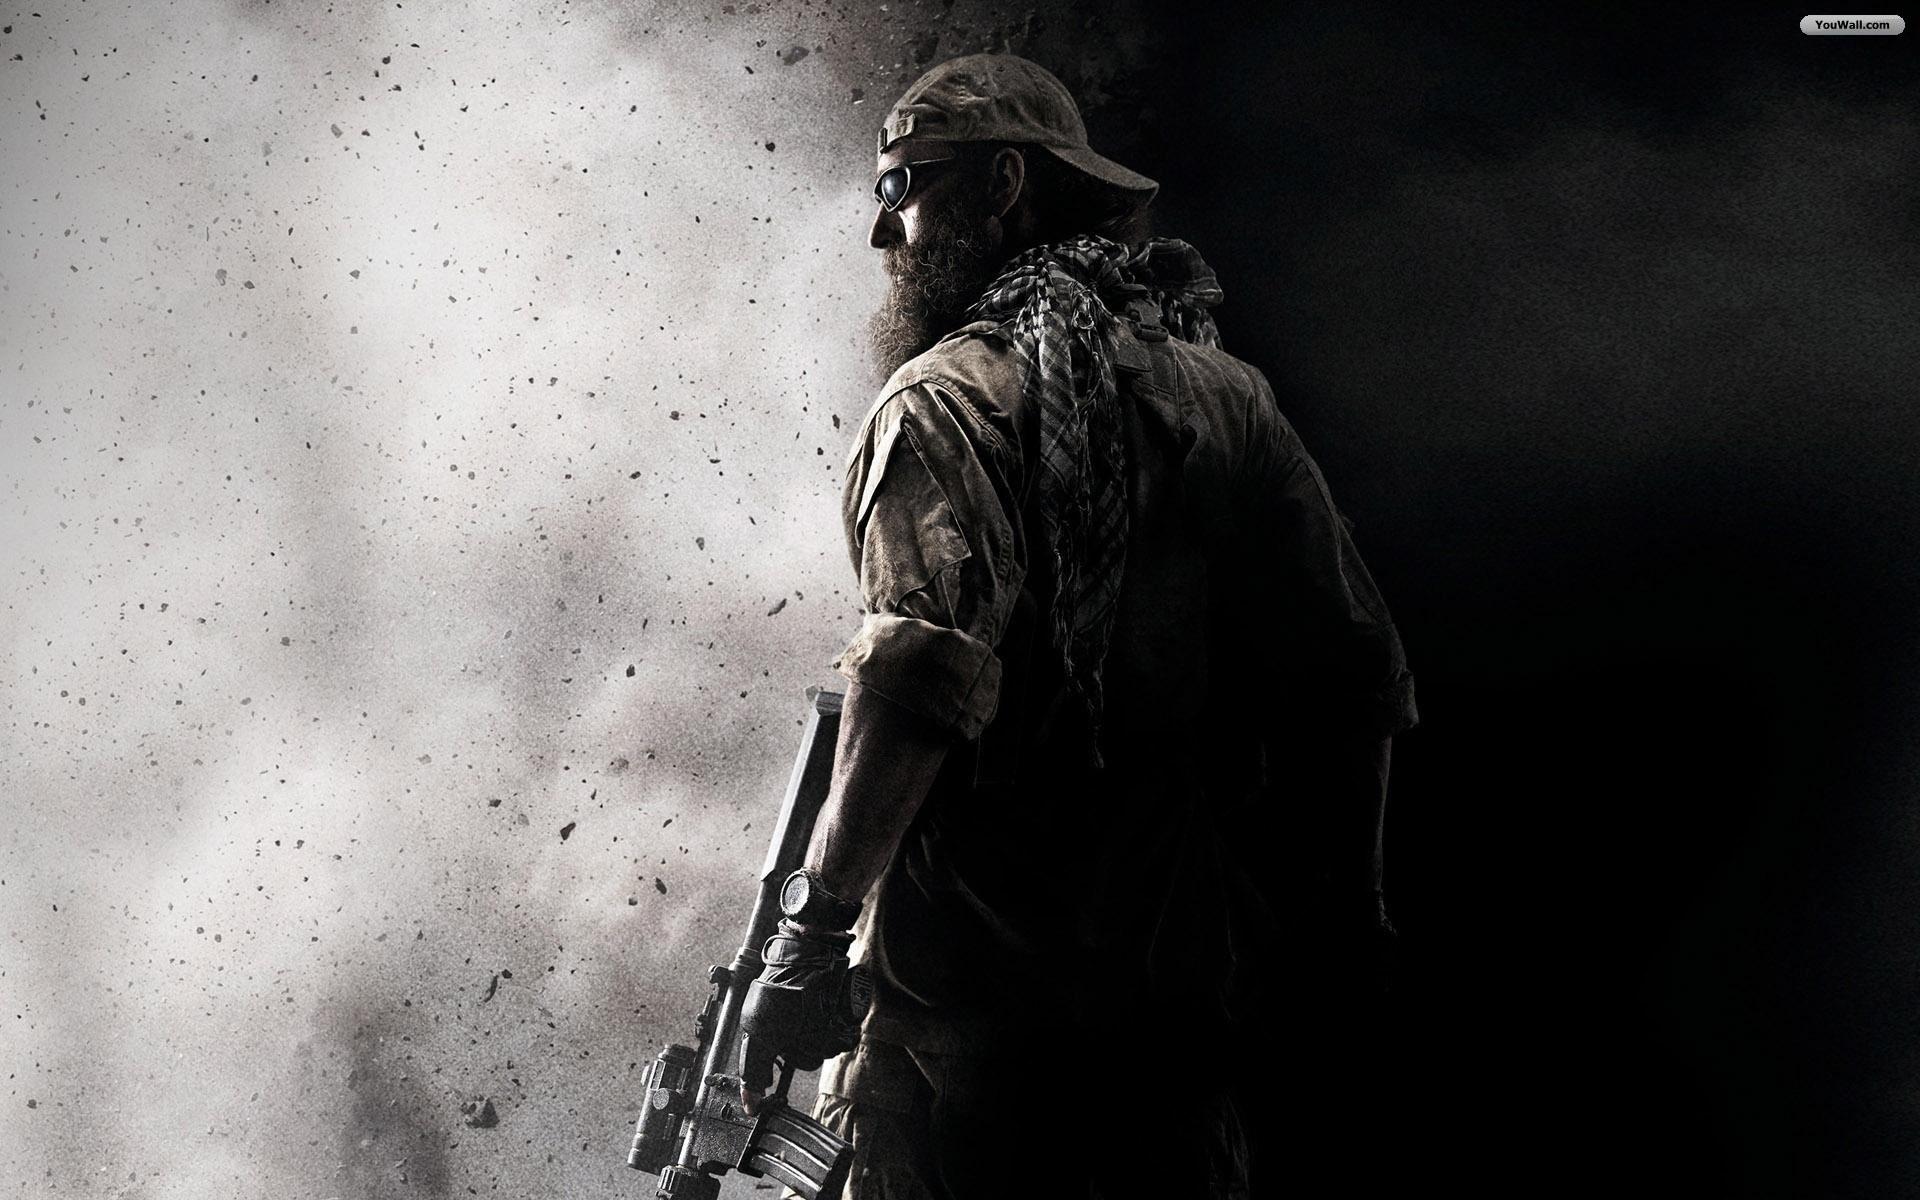 Soldier Wallpaper HD